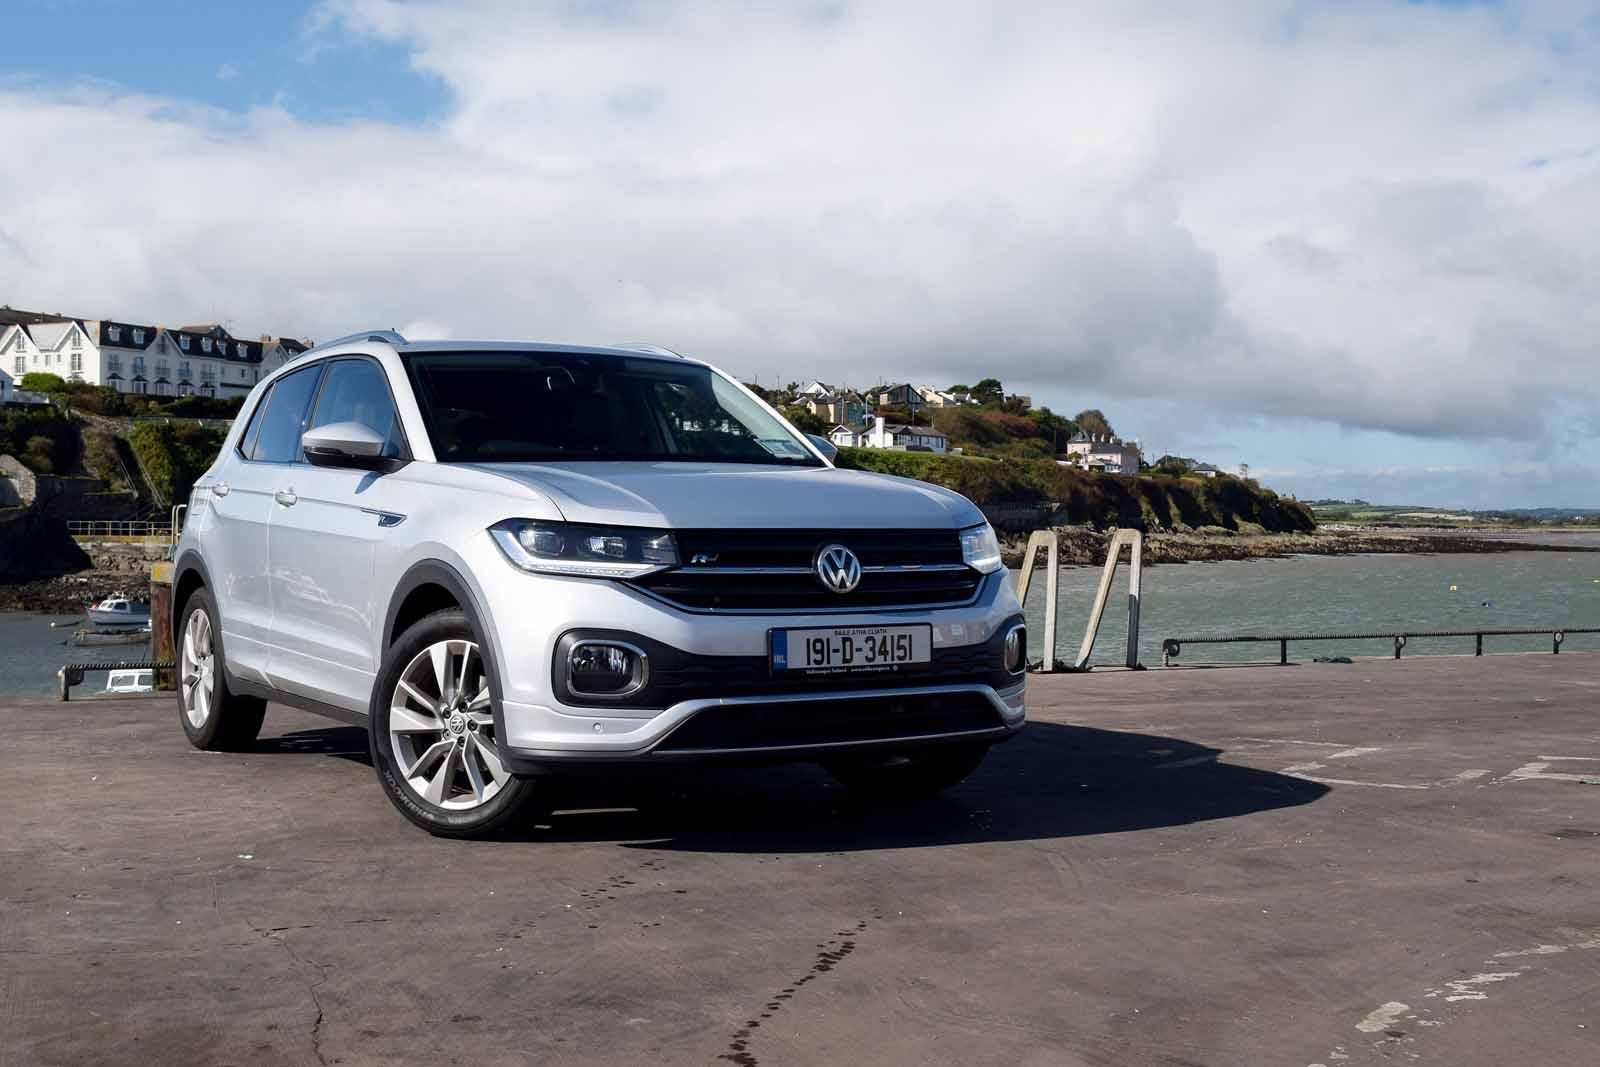 2019 VW T-Cross Review (2)